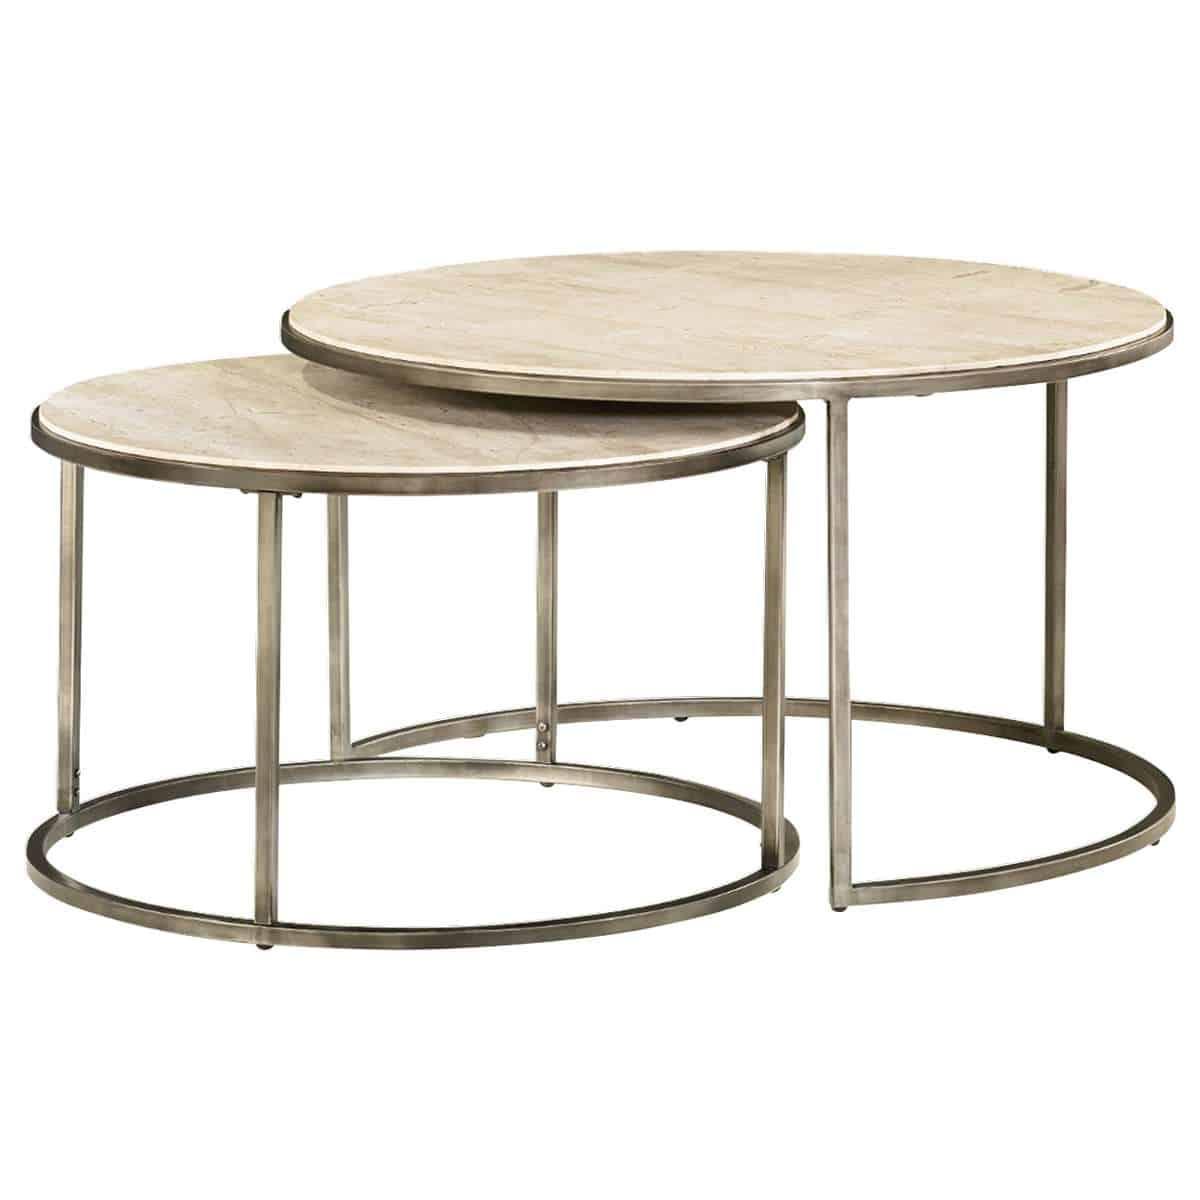 Modern Basics Round Coffee Table